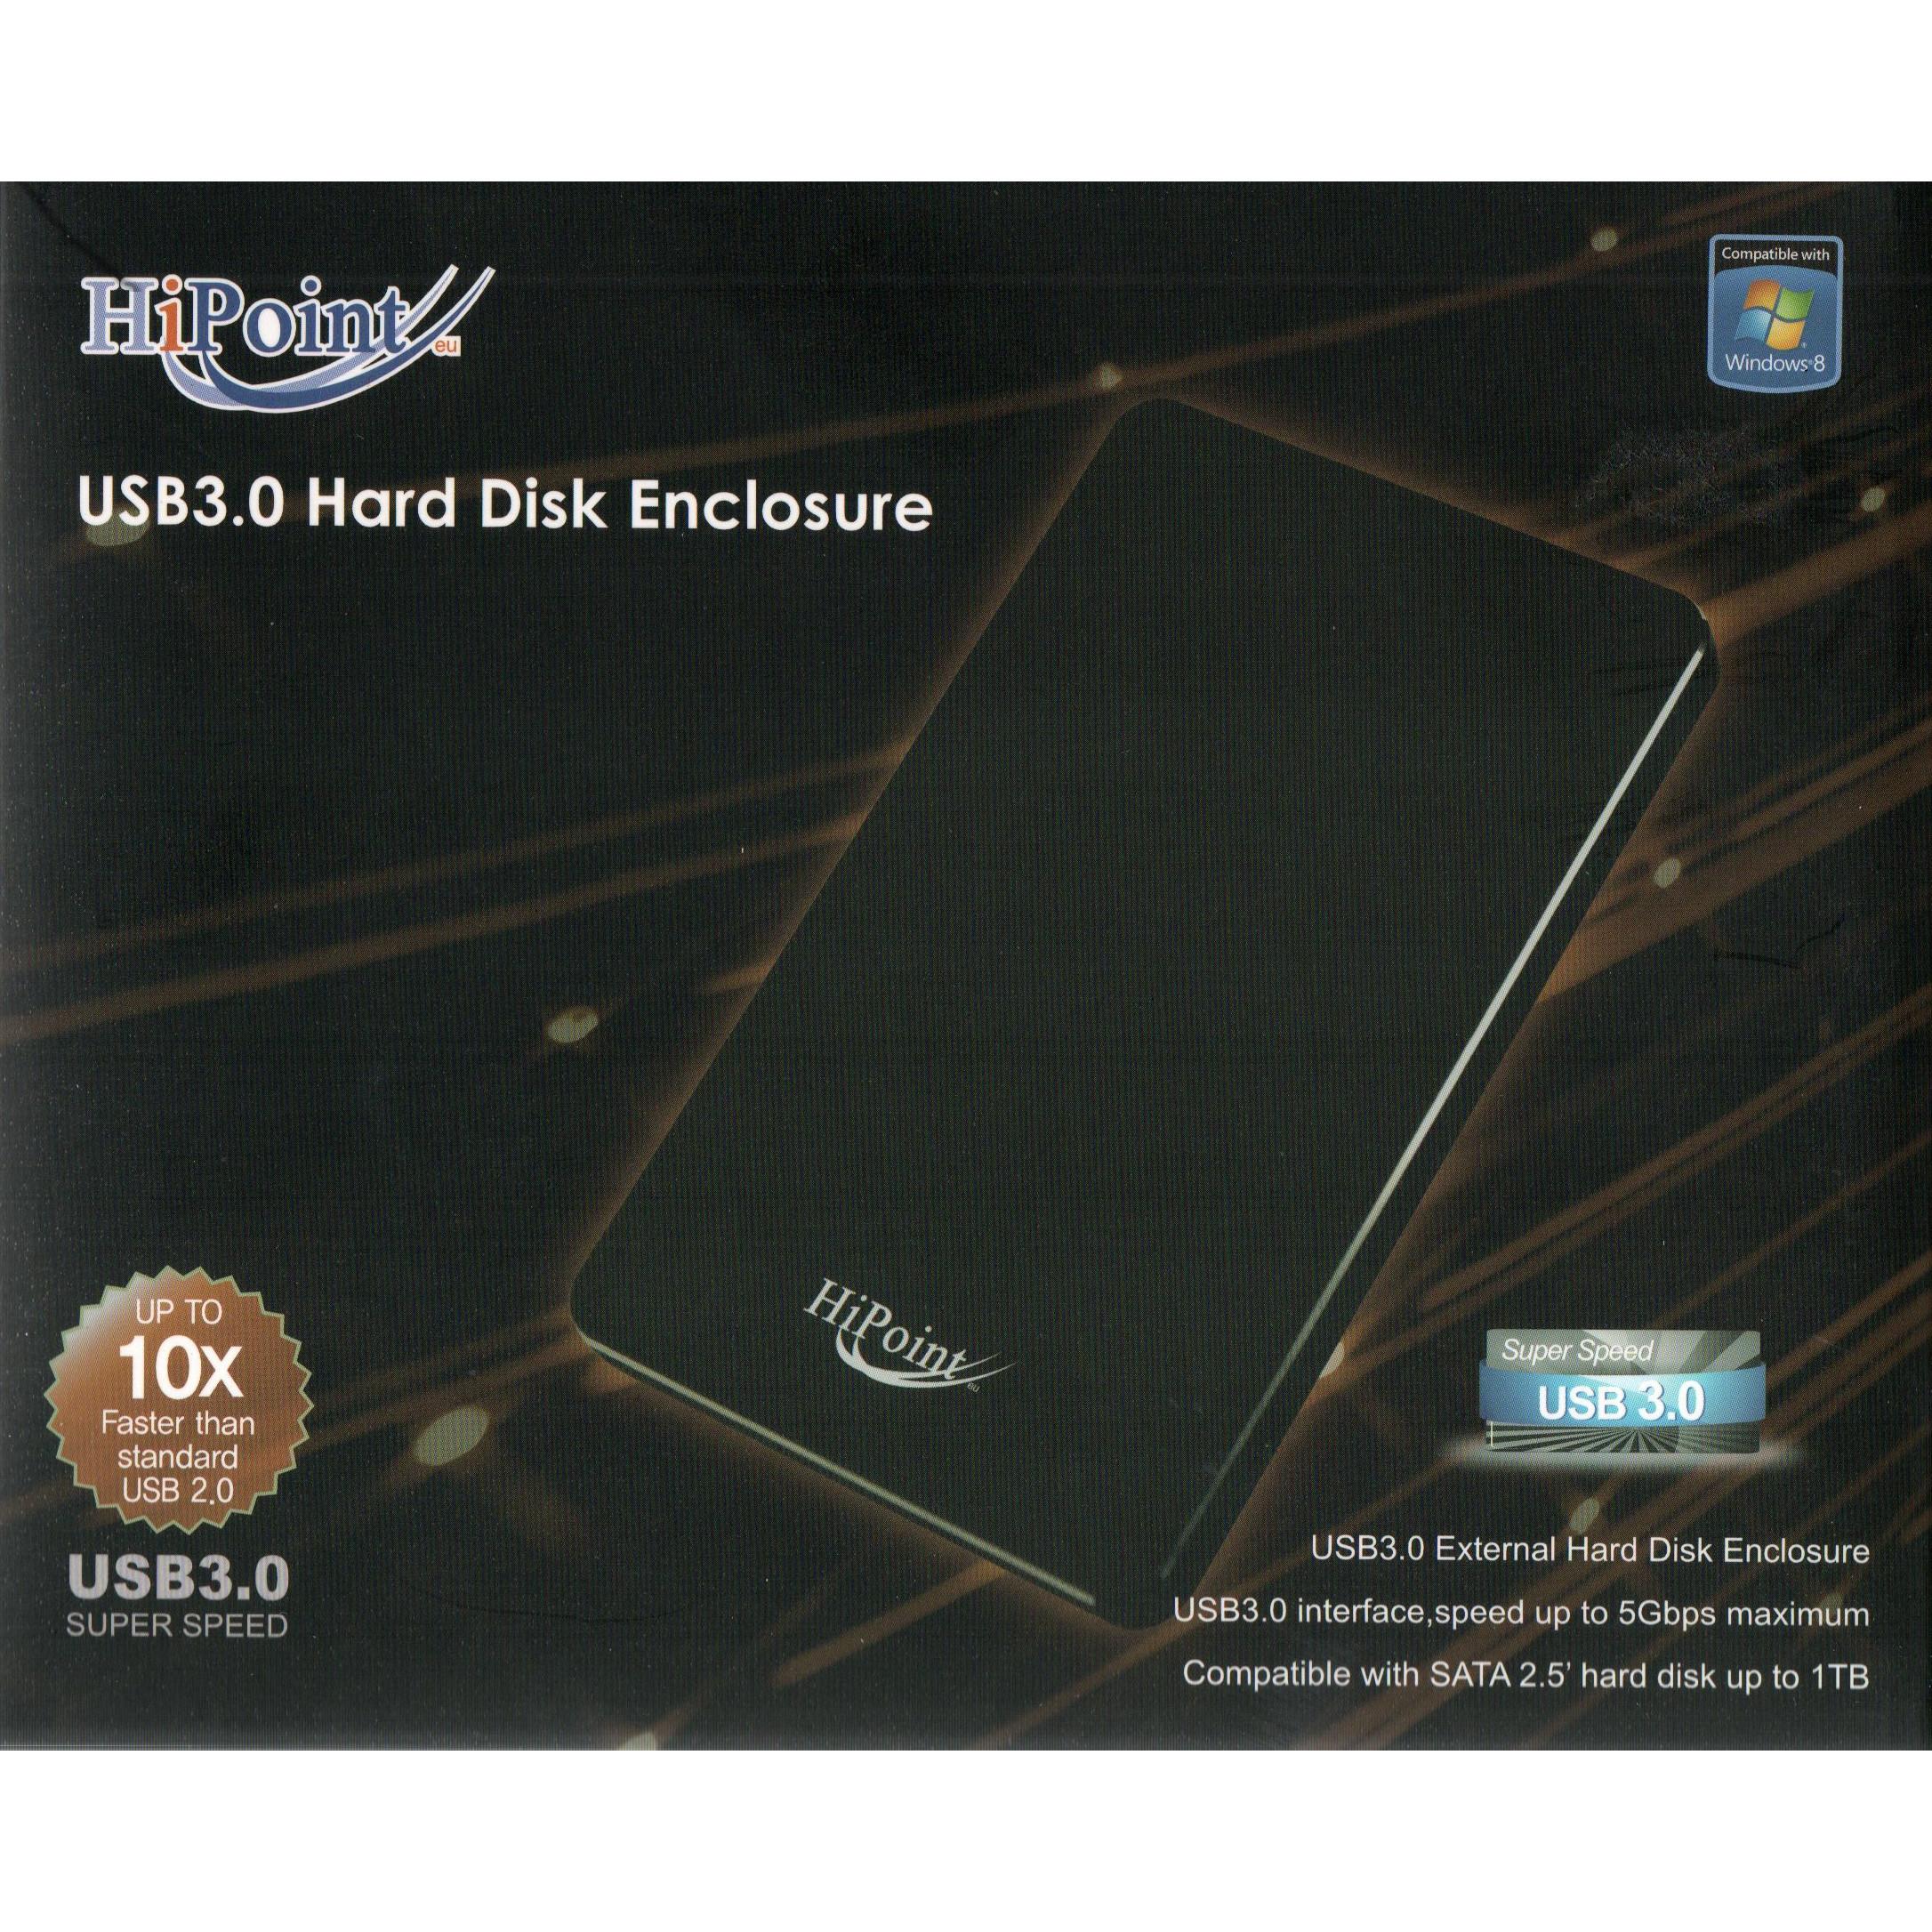 HiPoint USB 3 Hard Drive 2.5